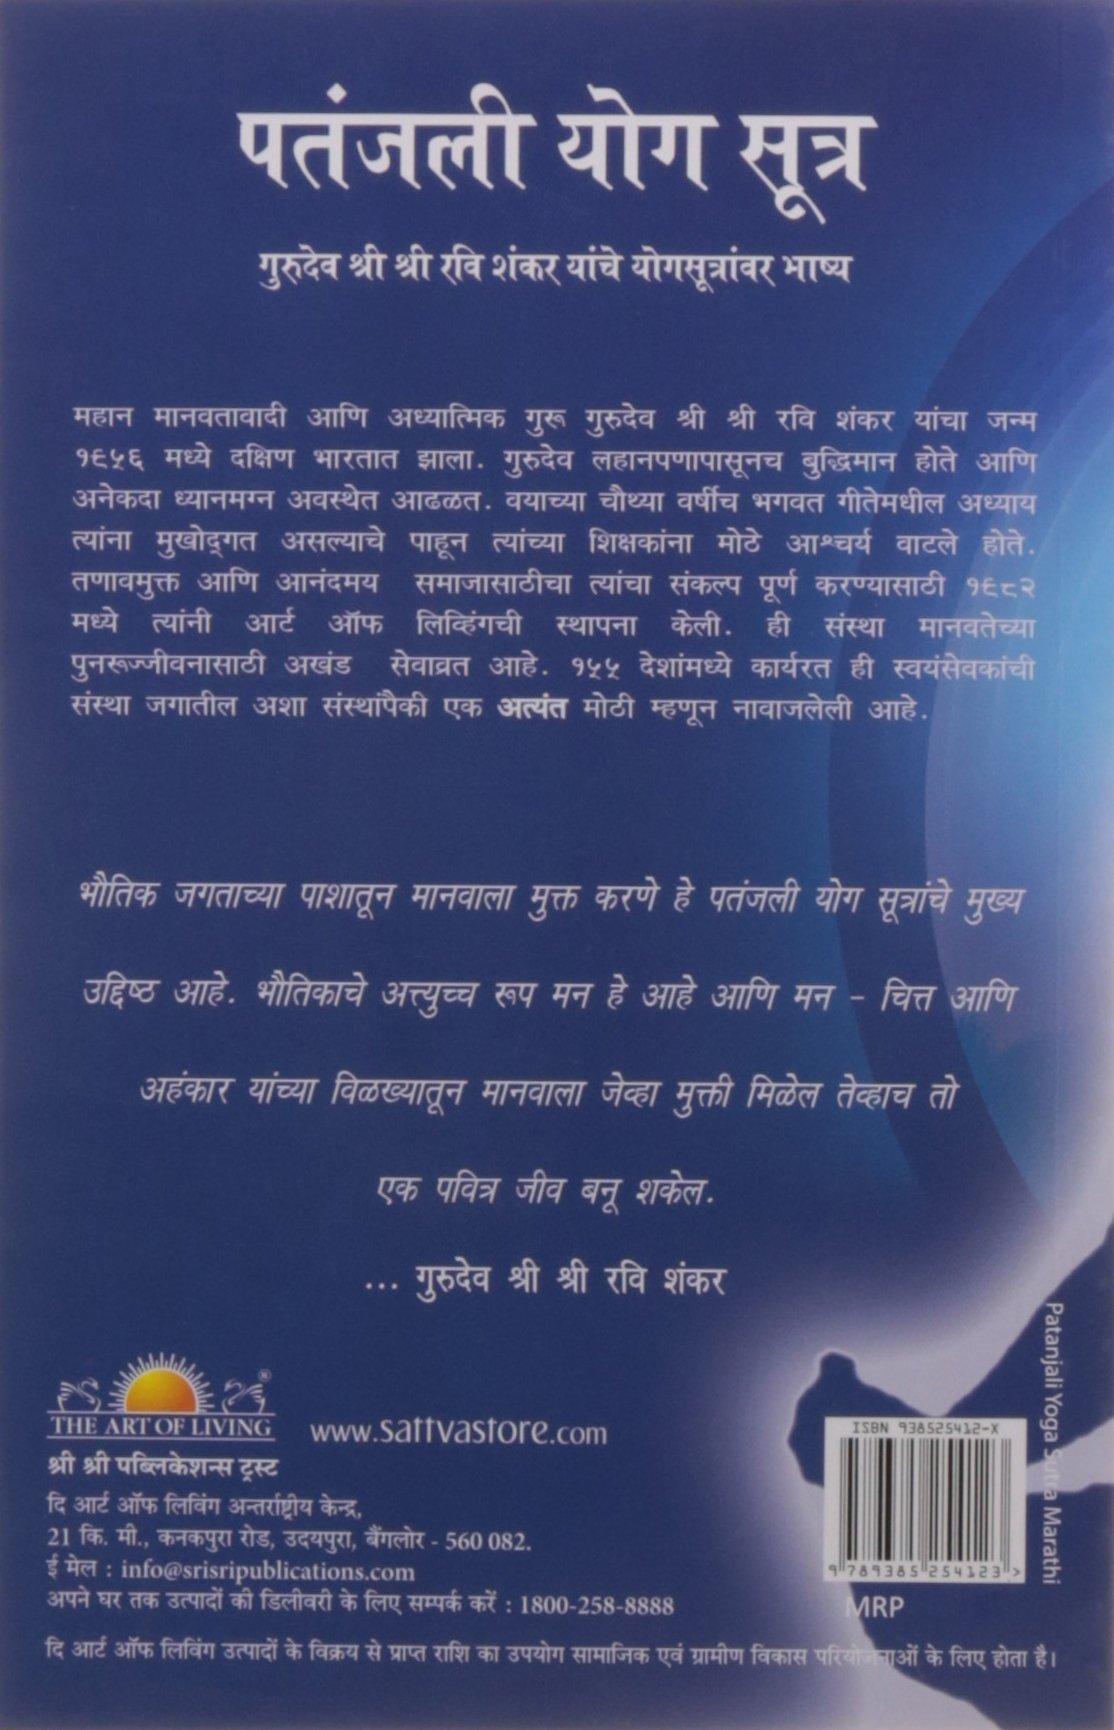 Patanjali Yoga Sutra In Marathi Yogawalls